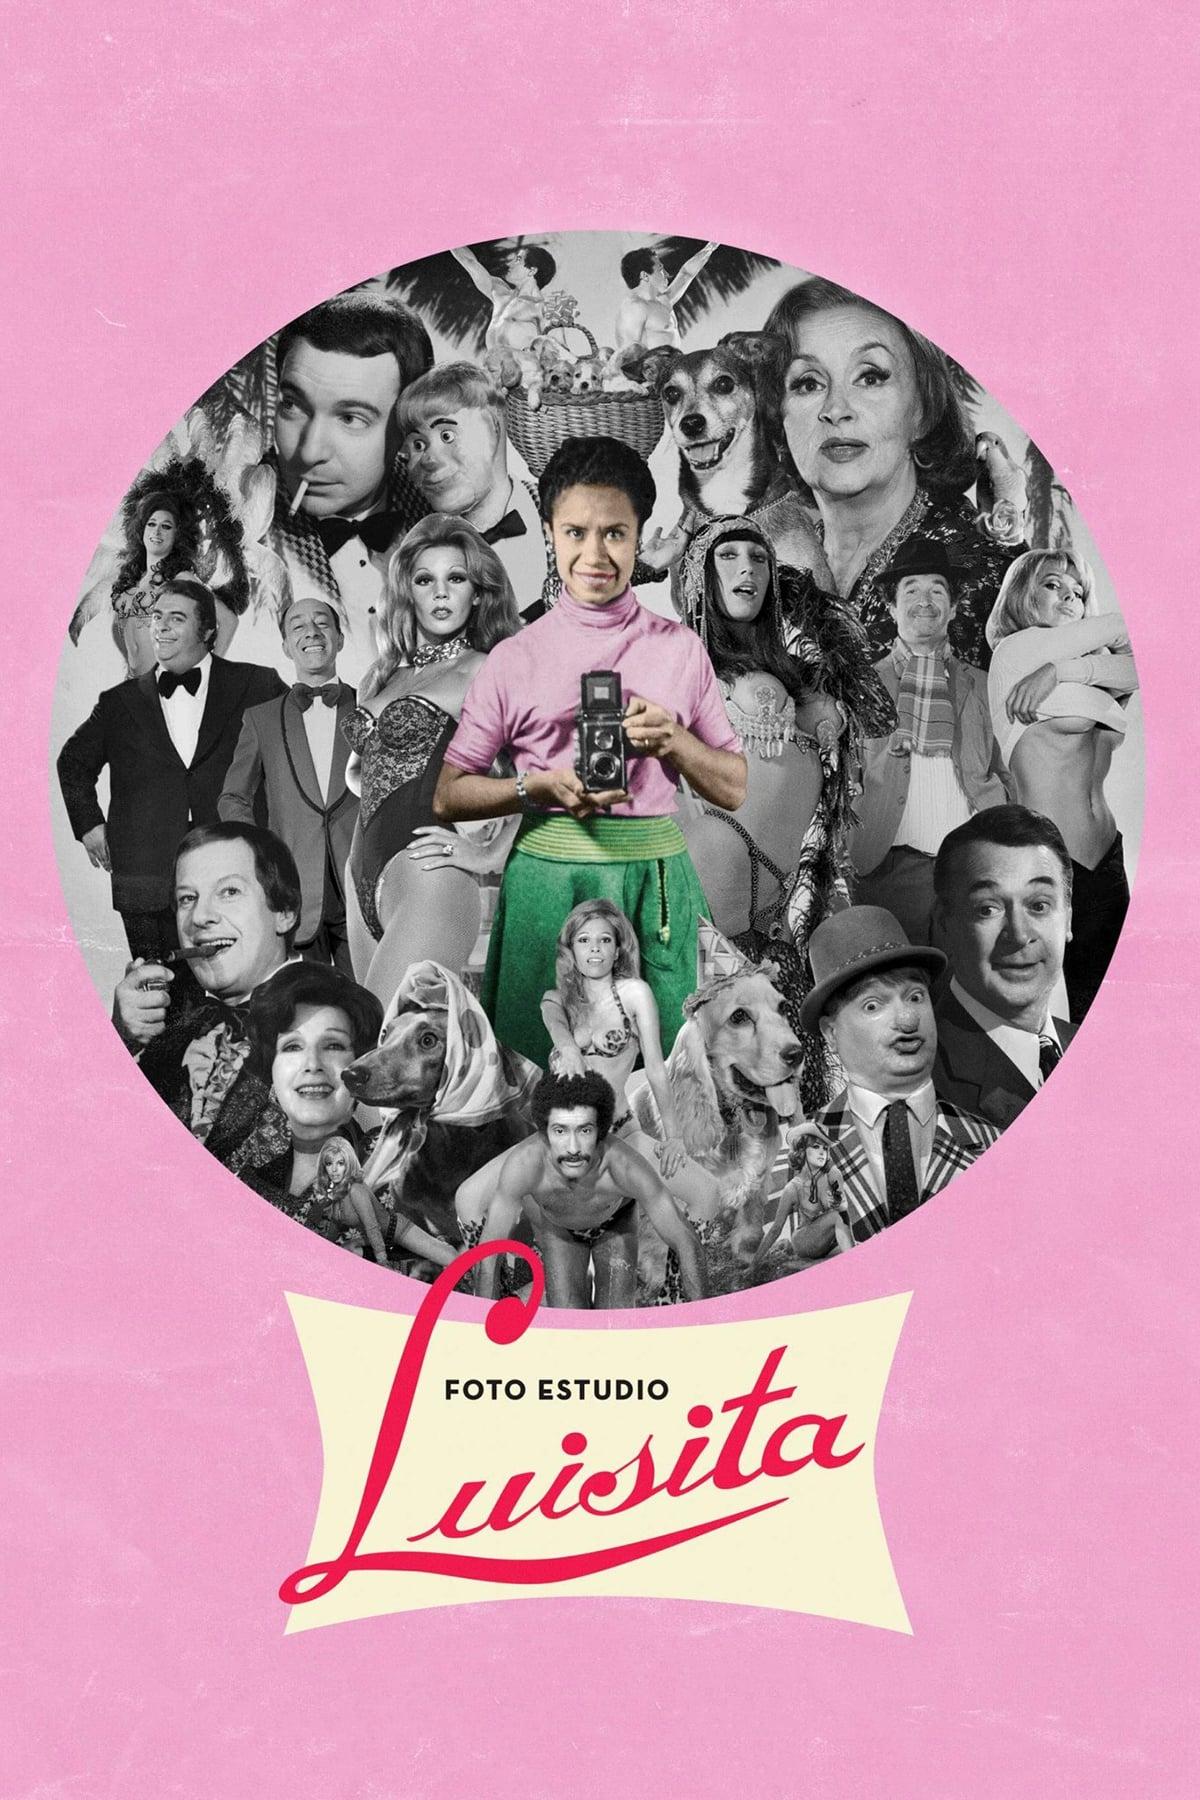 Luisita Photo Studio